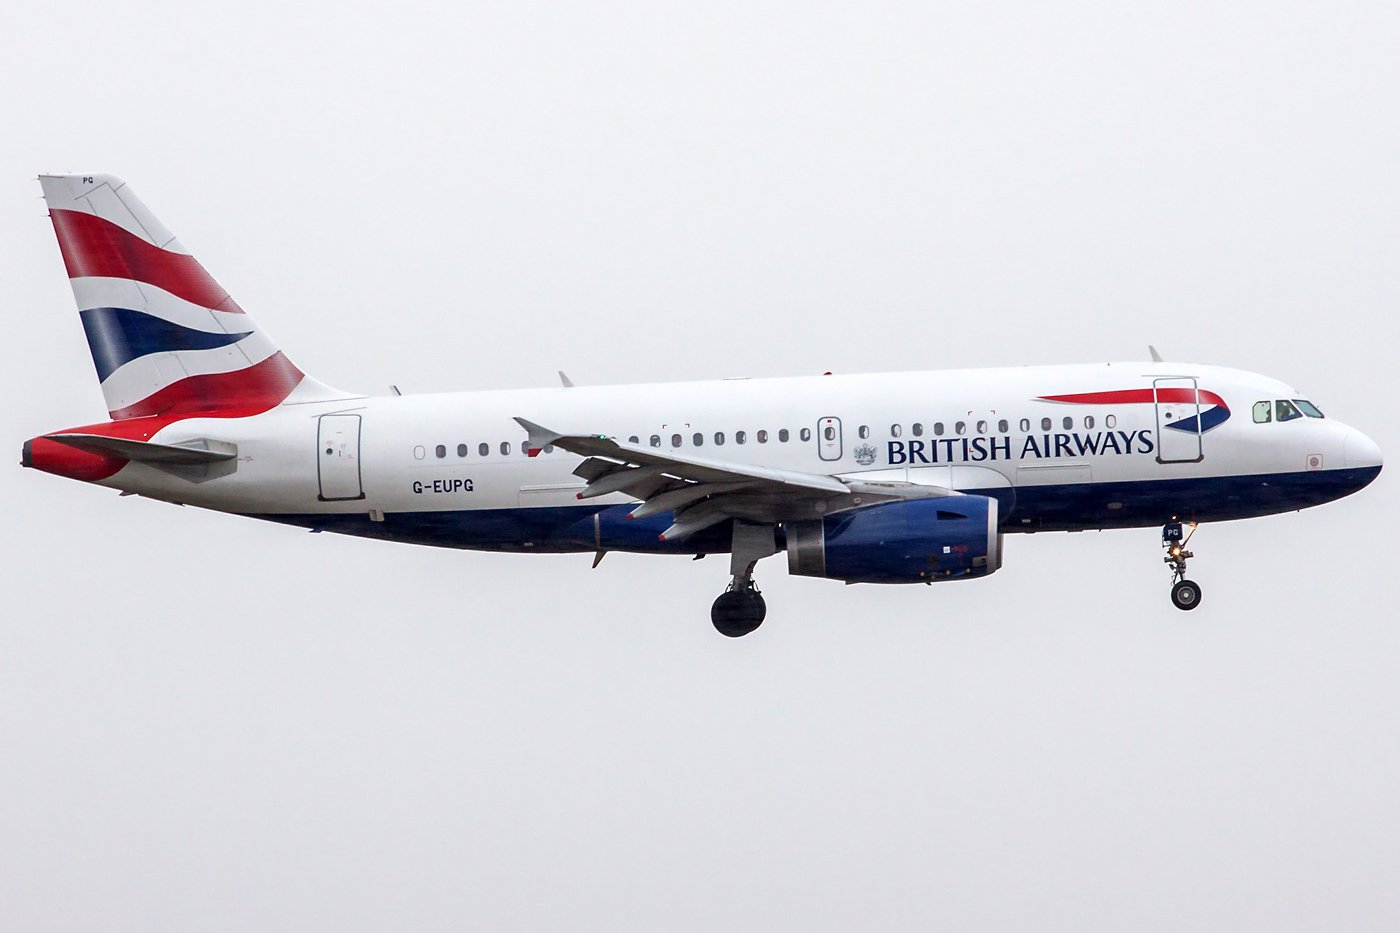 British Airways Airbus A319-131 G-EUPG